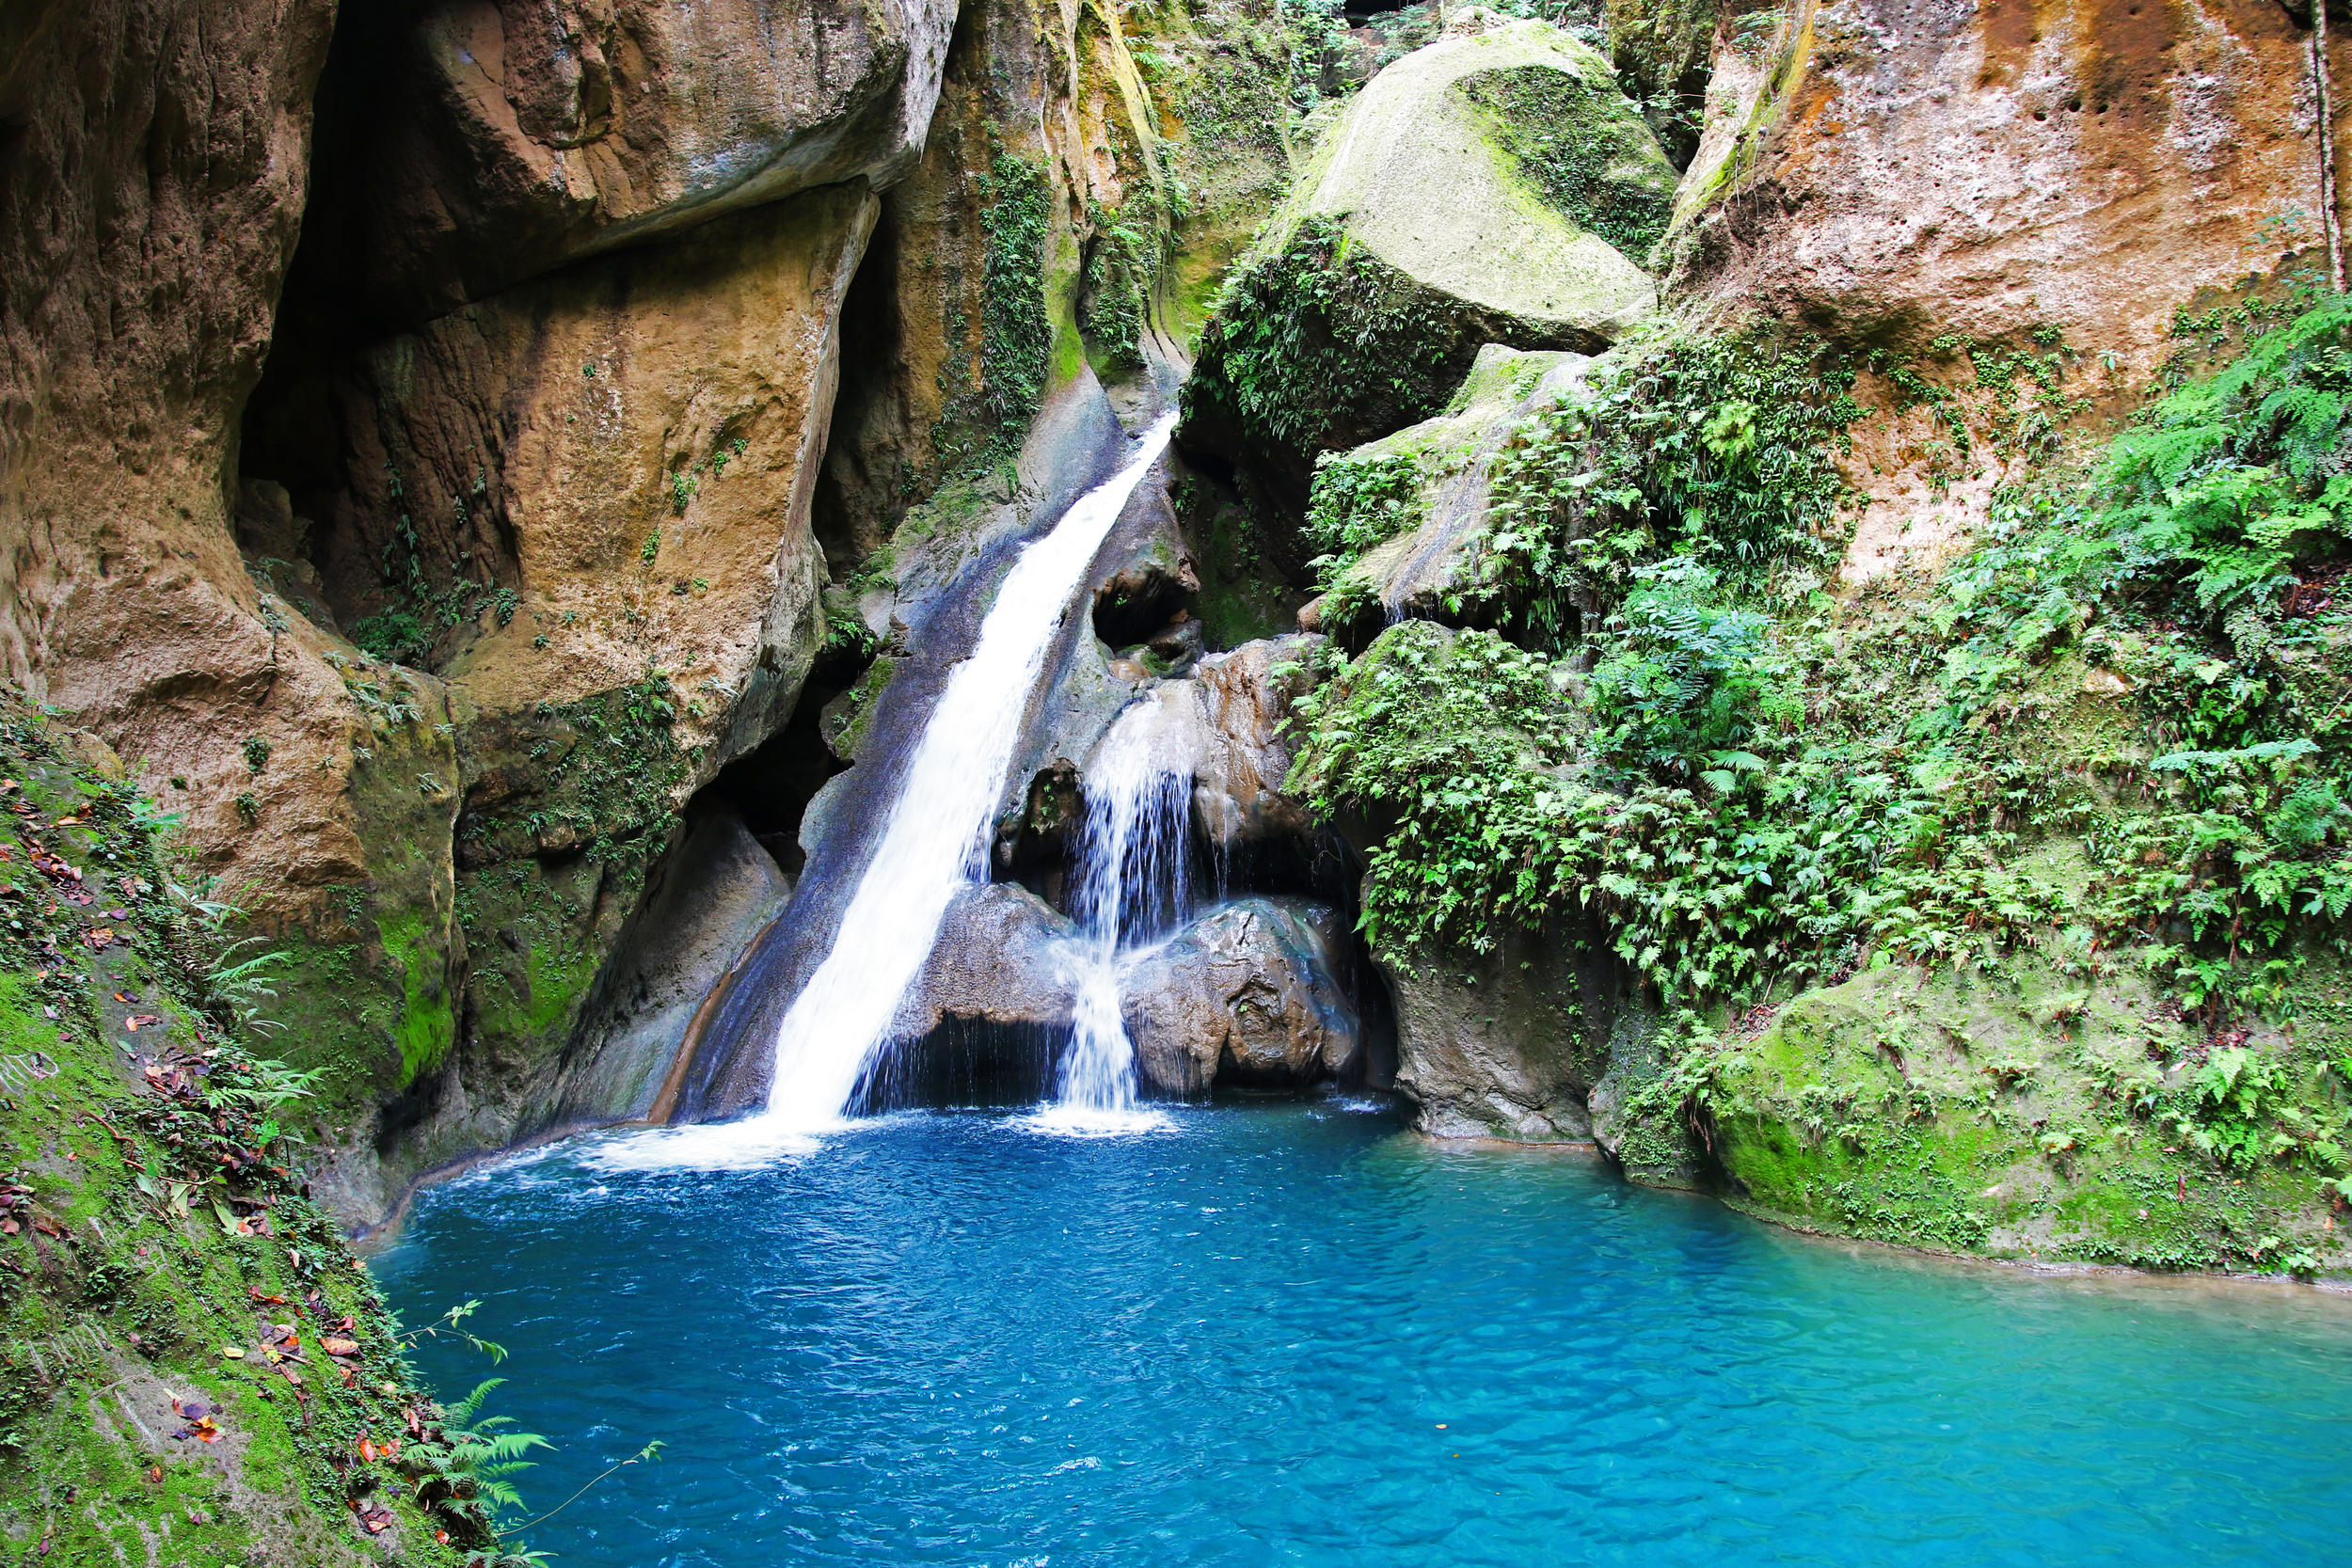 Bassin Bleu Waterfall